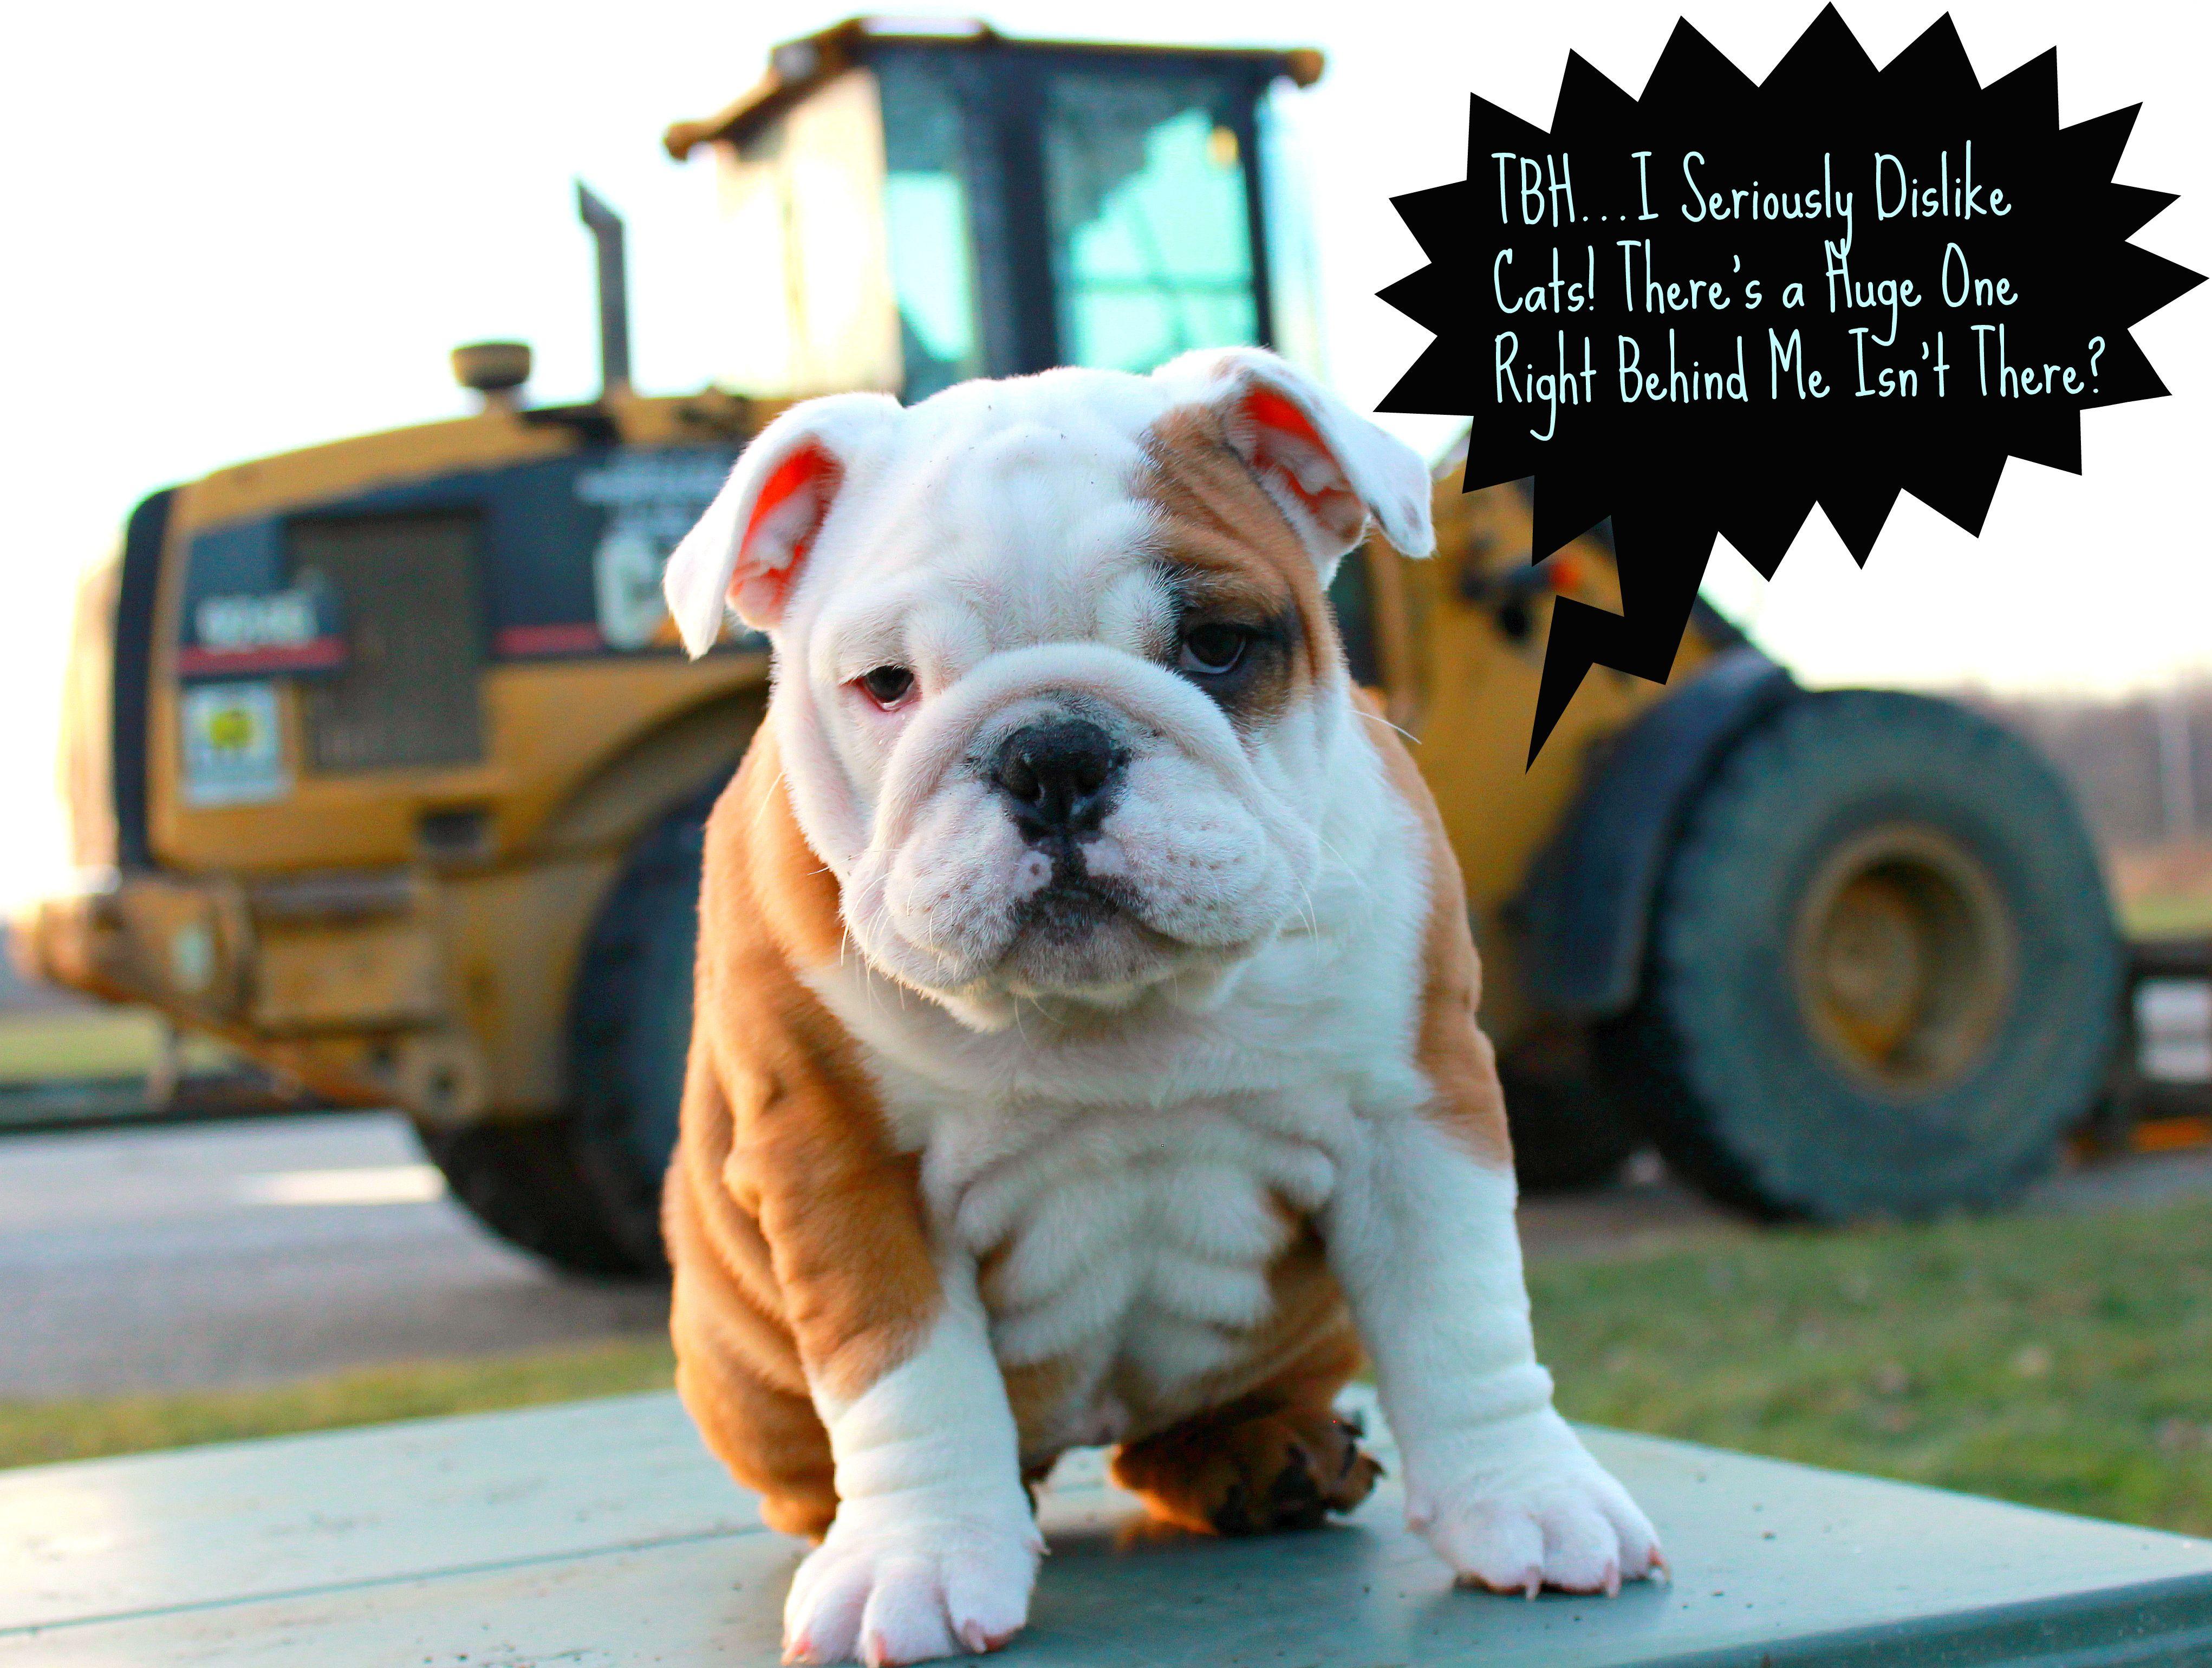 Indy S Got A Six Pack Of Rolls Bulldog Puppies English Bulldog Care Bulldog